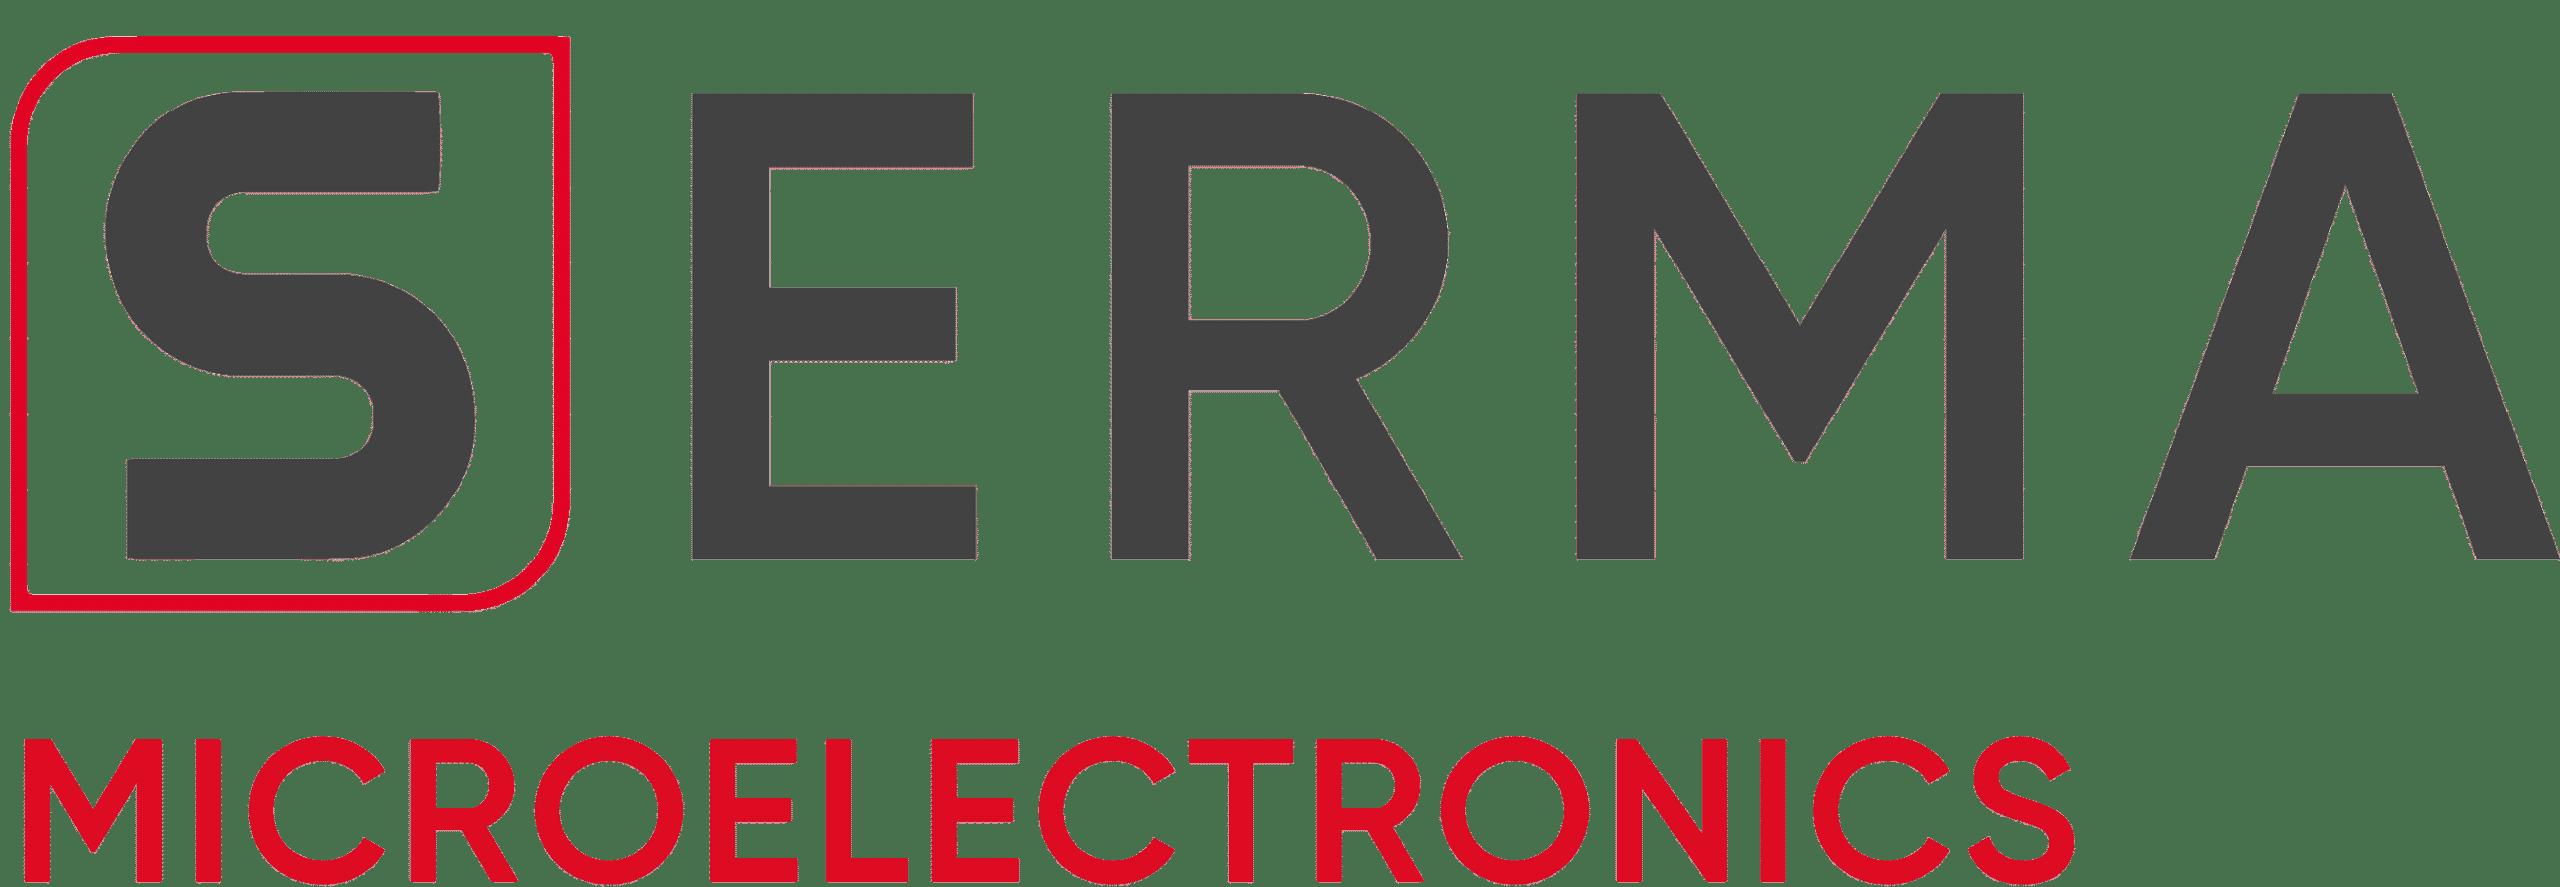 SERMA MICROELECTRONICS